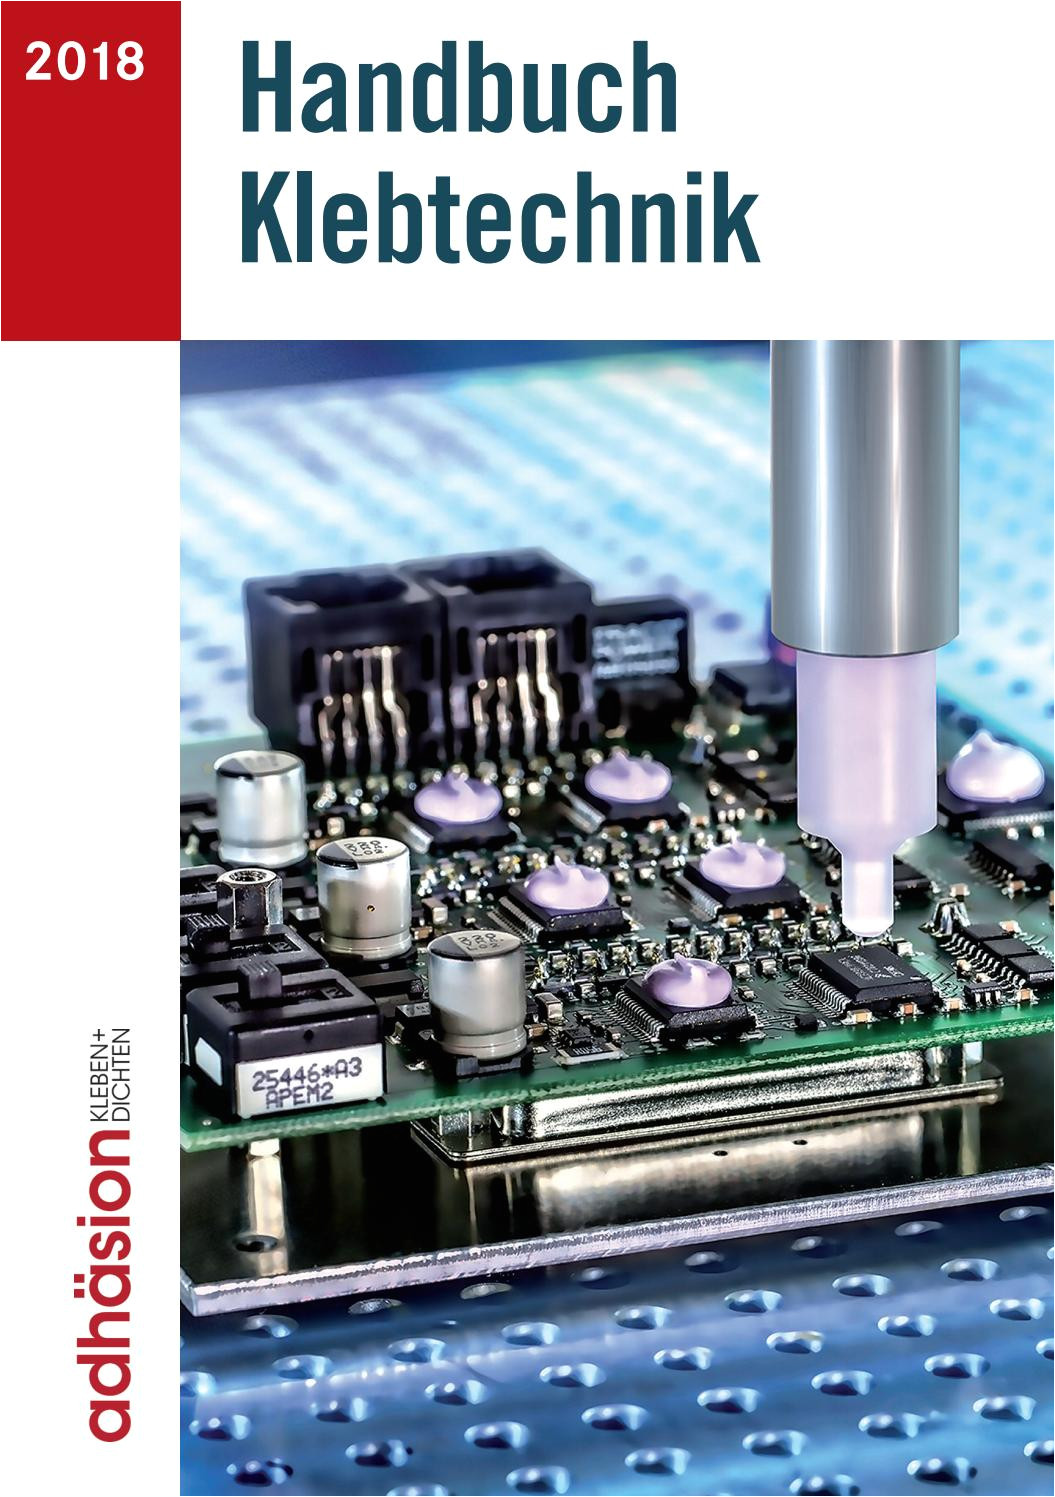 Electronics Recycling Greensboro Nc Handbuch Klebtechnik by Duoo Photography issuu